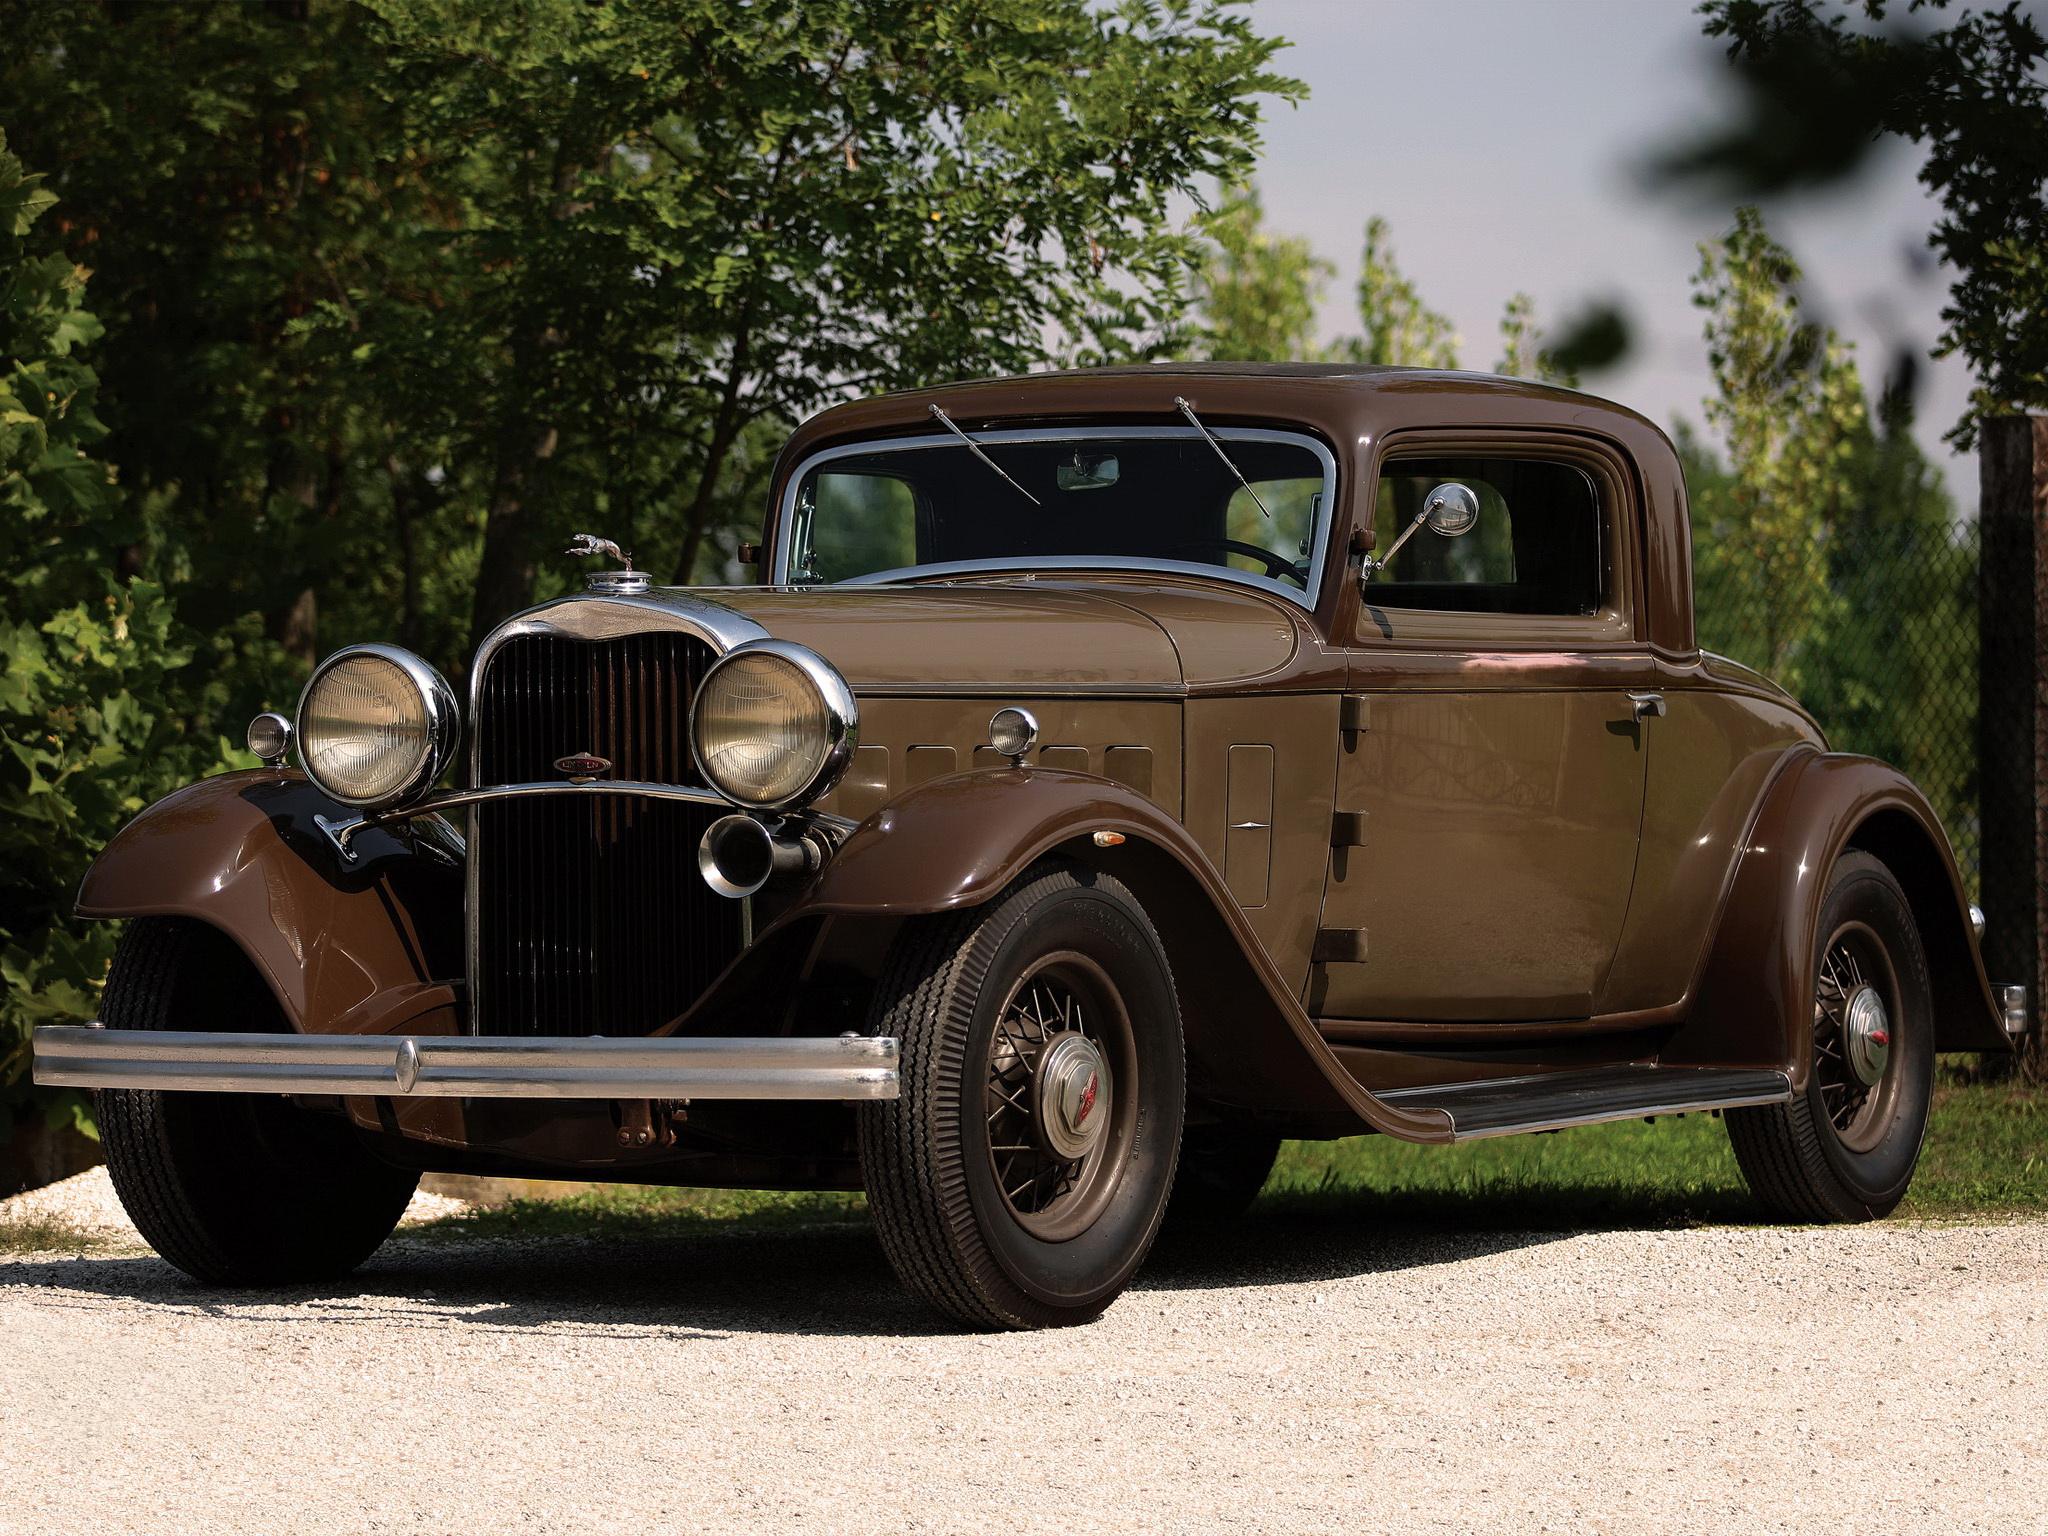 1932 Lincoln Model Ka Coupe Retro Wallpaper 2048x1536